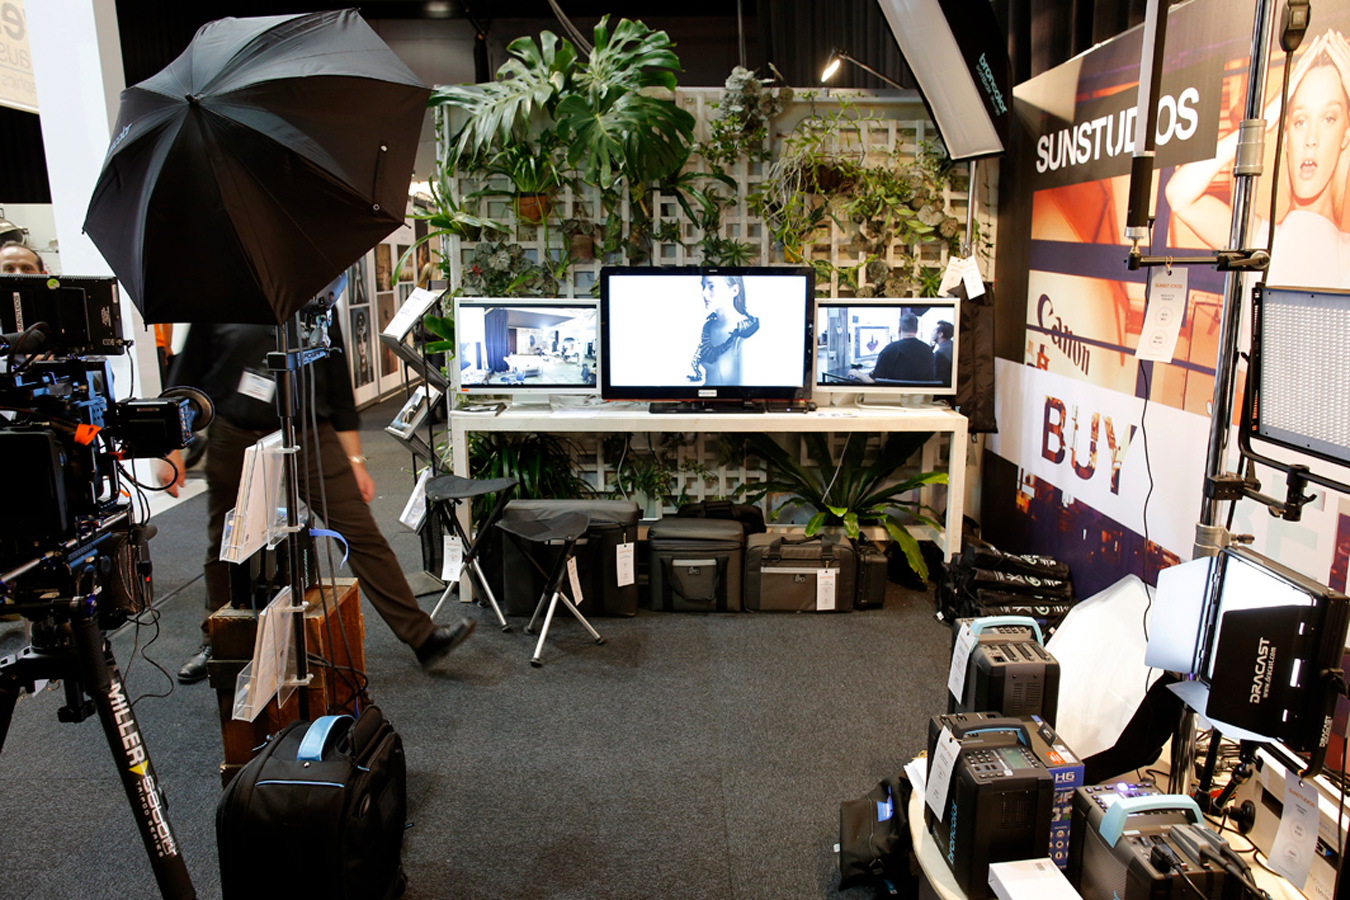 SUNSTUDIOS studio set up at the Digital Playground Trade Show 2014